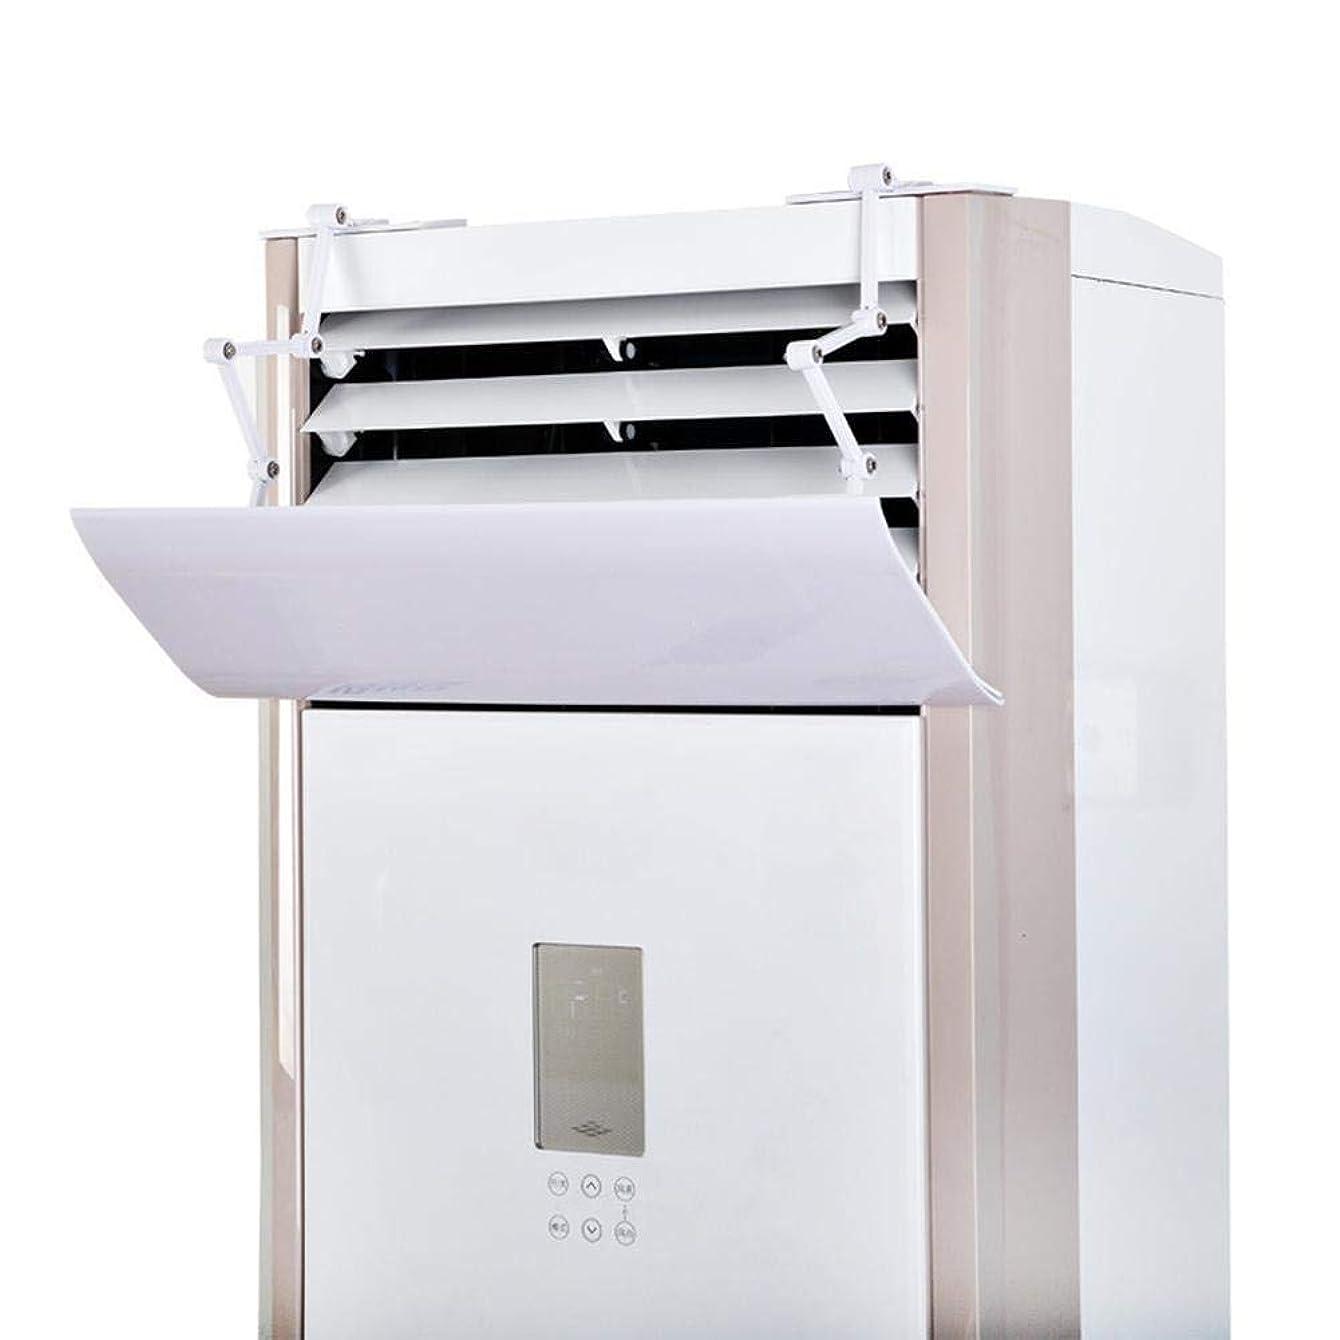 U-smile Vertical Air Conditioner Deflector Confinement Air Deflector Adjustable Air Conditioning Self-Adhesive Universal Telescopic Windshield